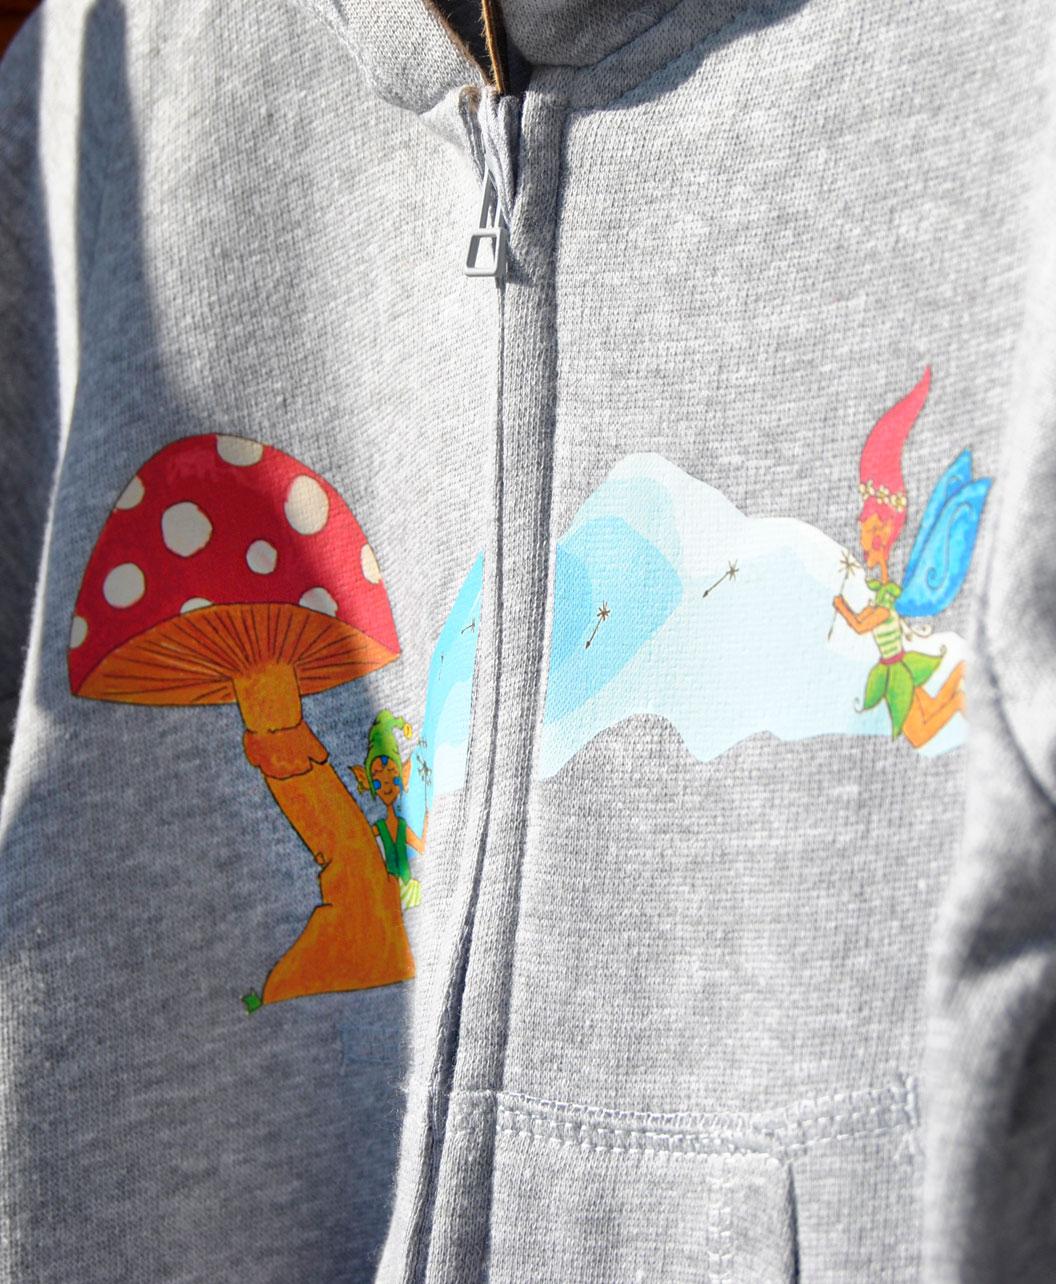 chandal buzo enterizo pijama overall original para bebe diferente seta duende hada